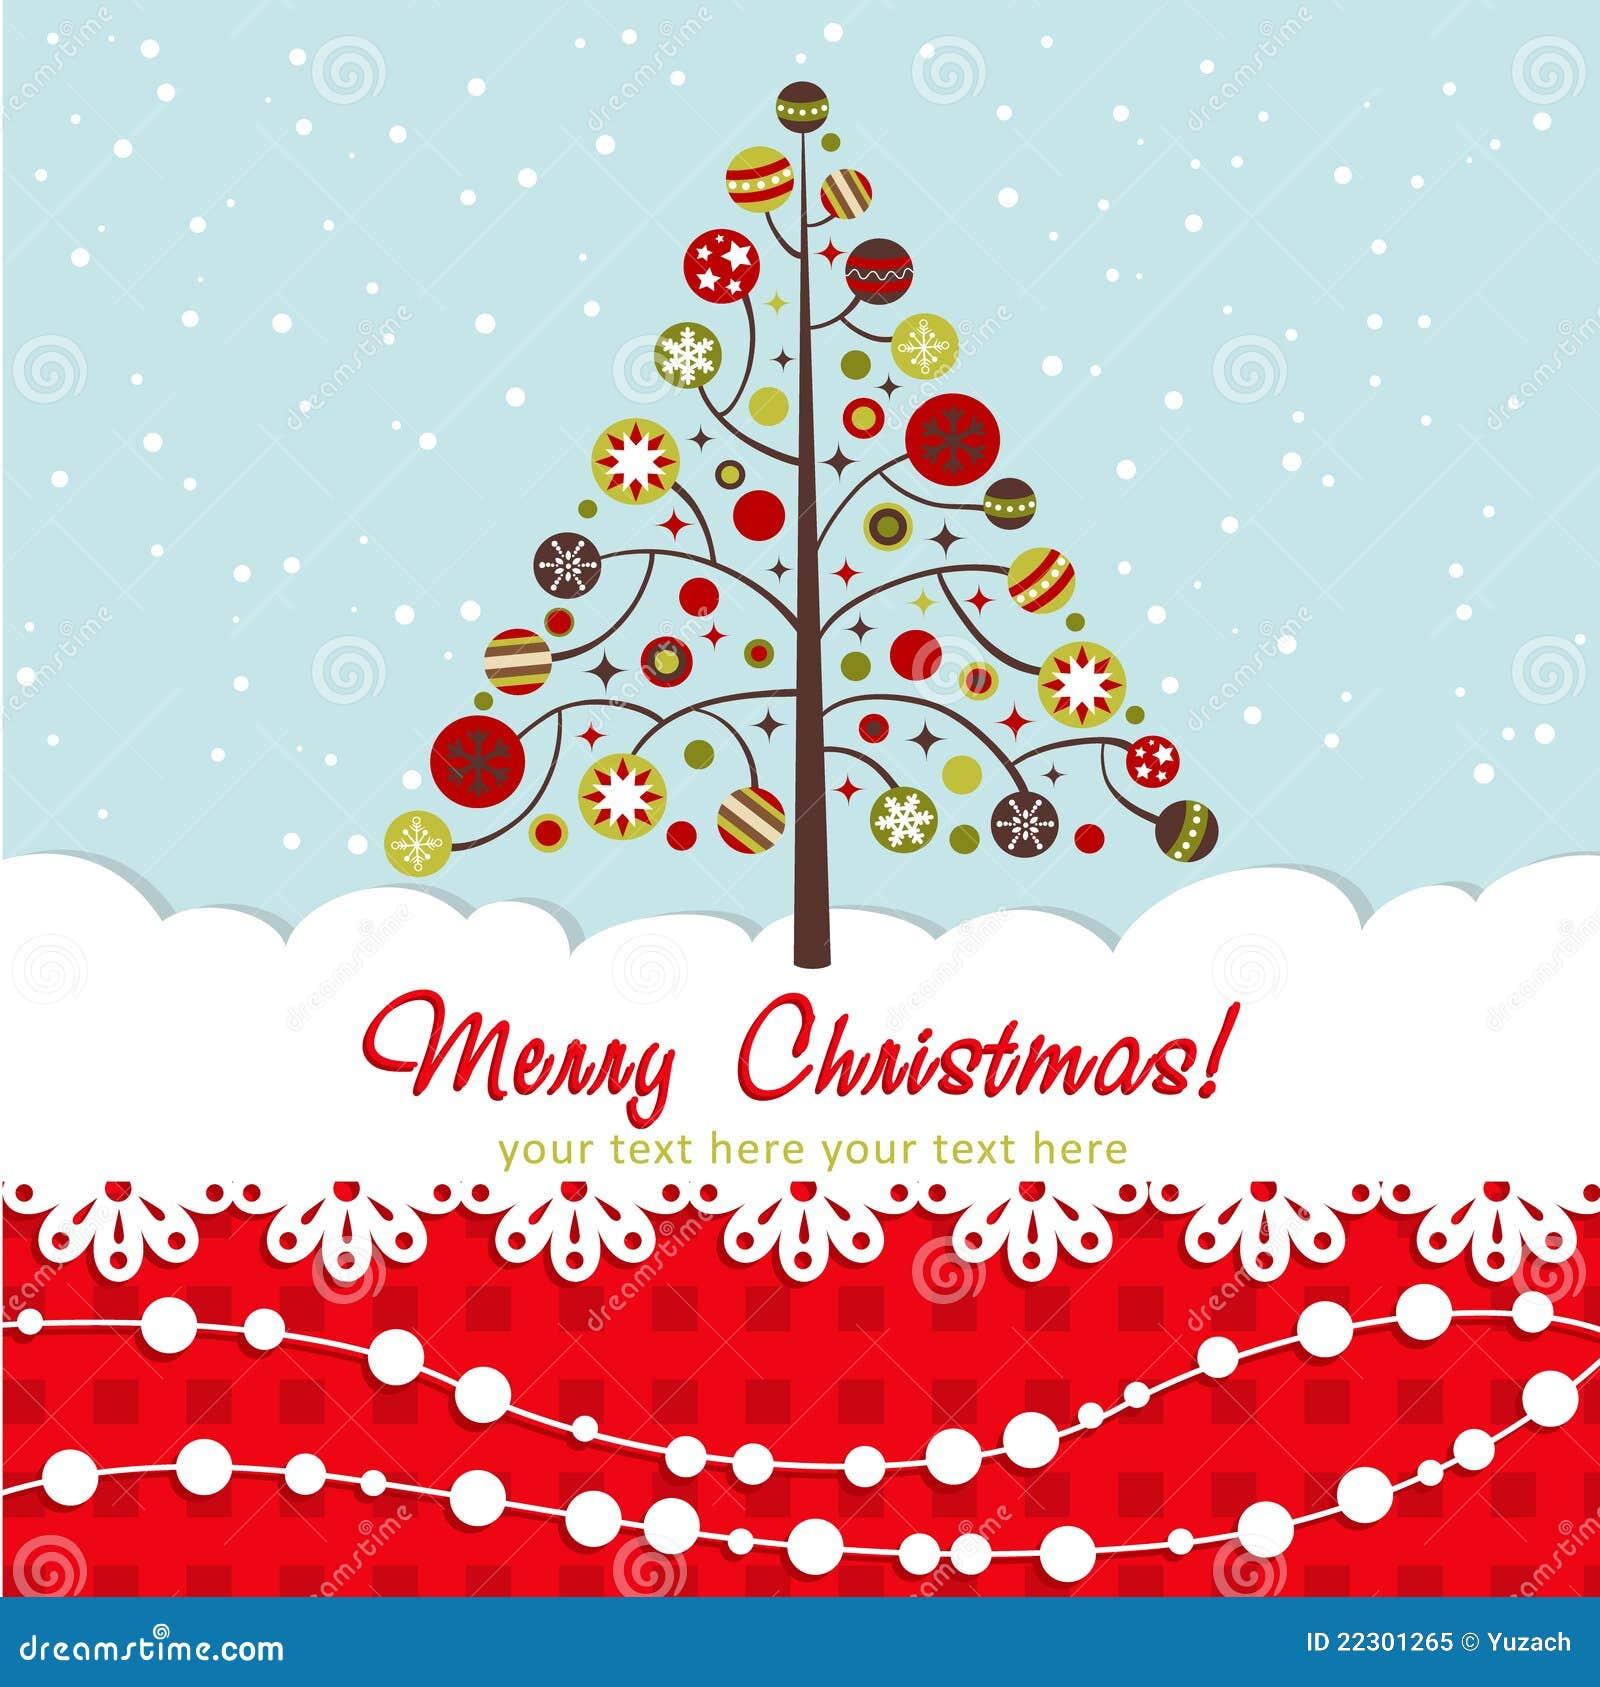 Ornate Christmas Card With Xmas Tree Royalty Free Stock Photo ...